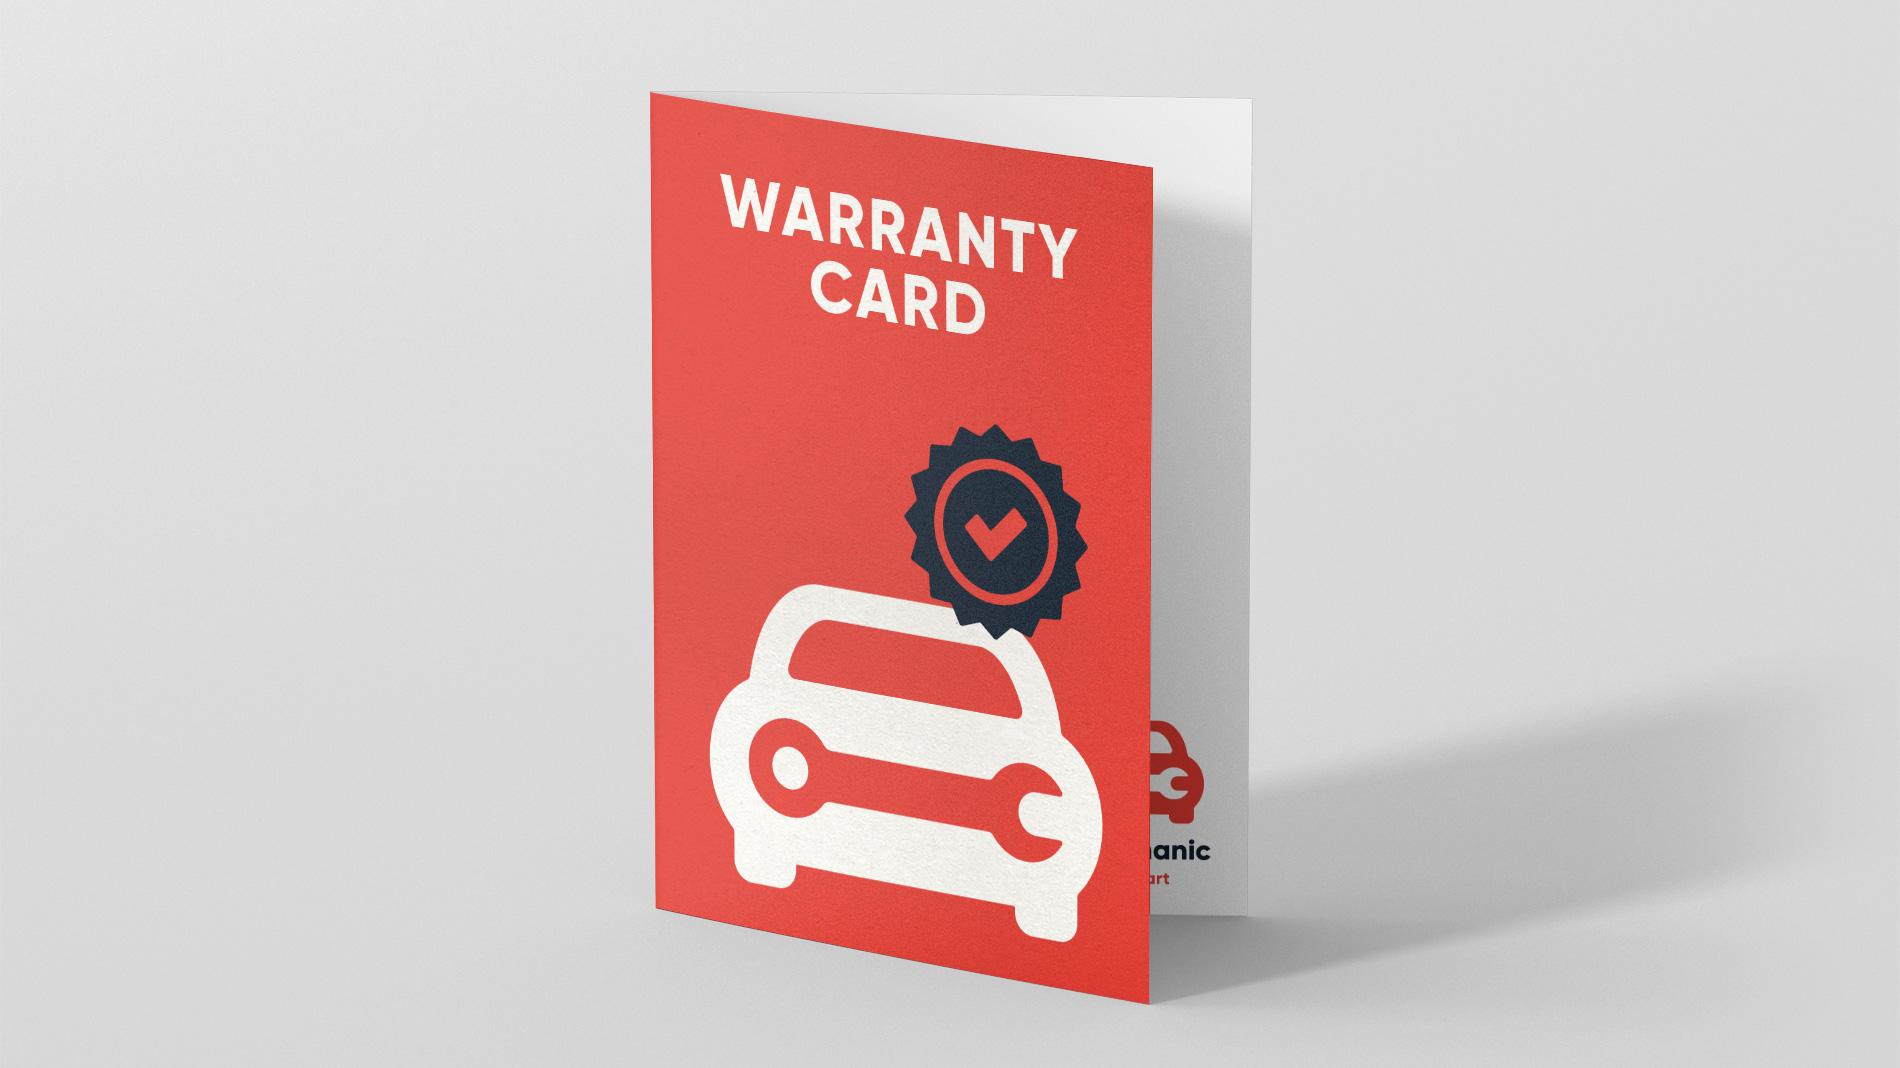 WarrantyCard